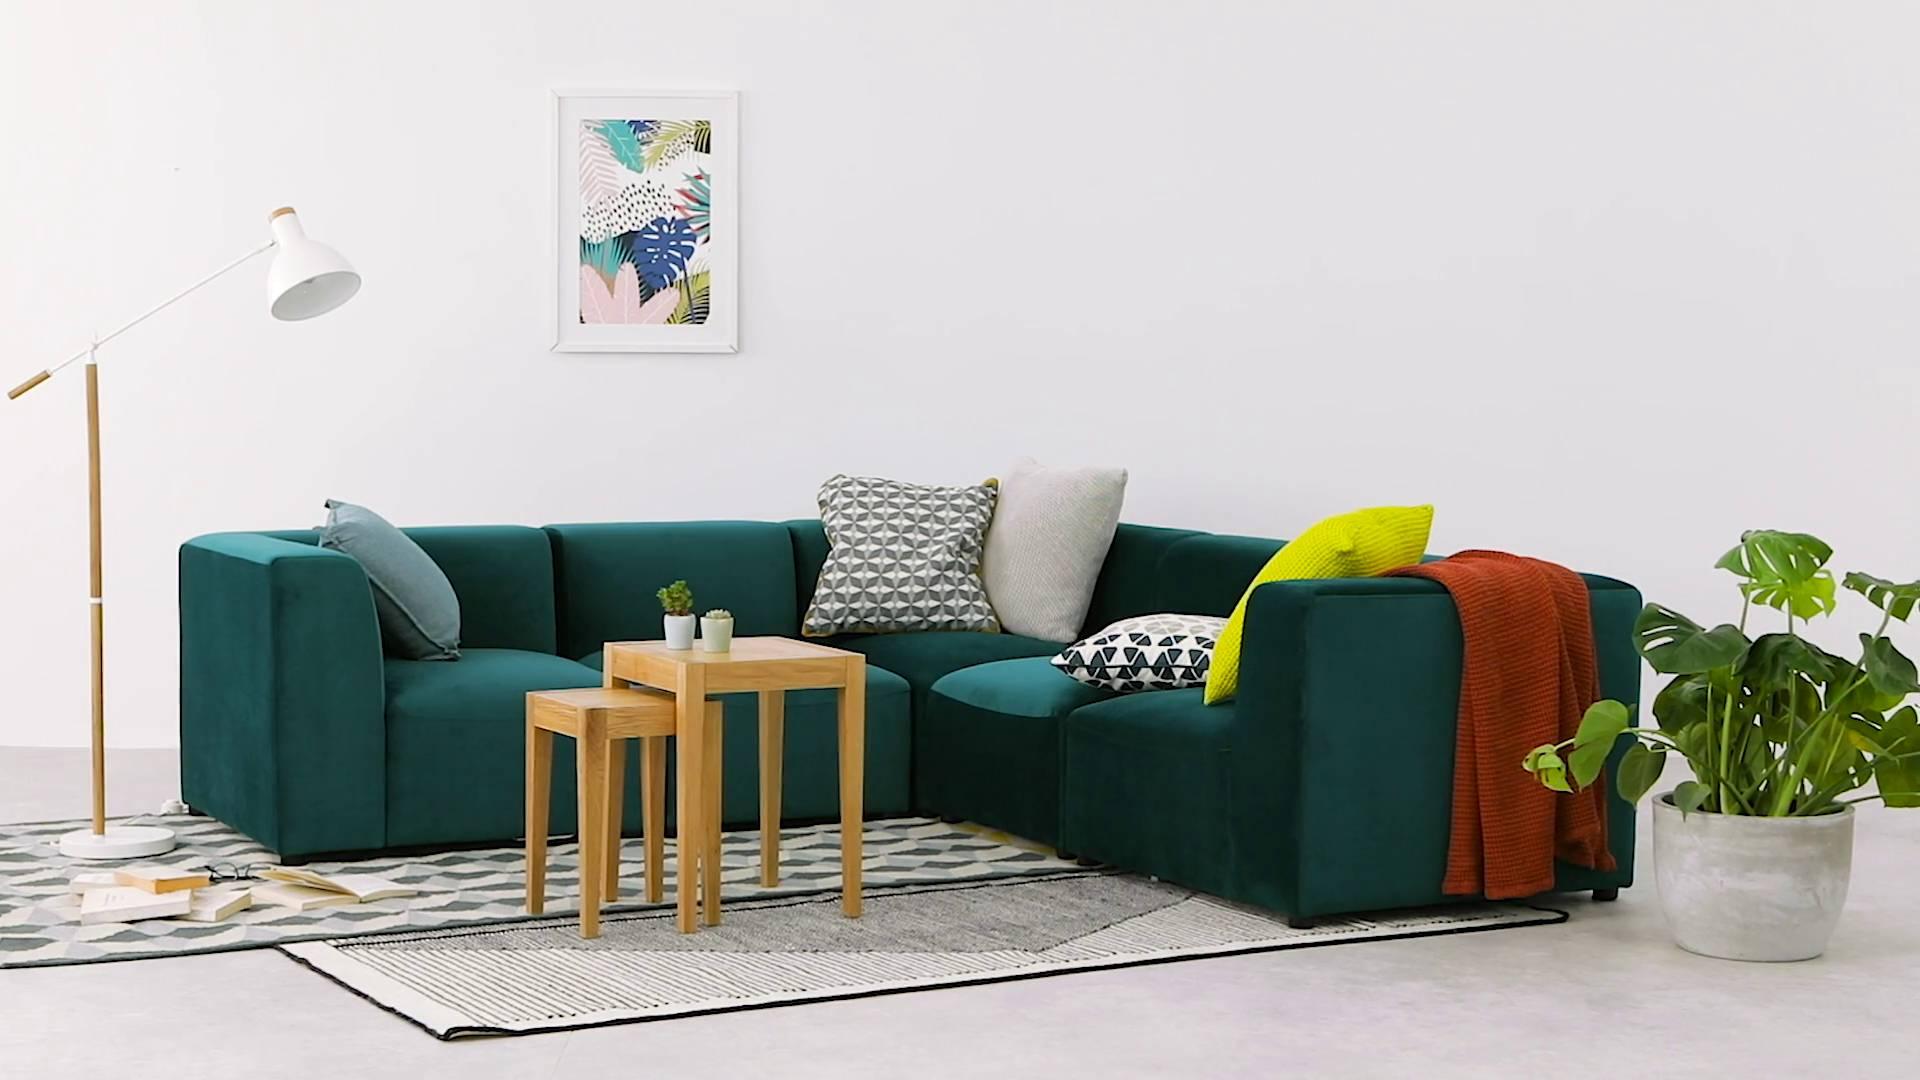 modular sofas ireland sofa tucson juno 5 seater corner seafoam blue velvet made com video thumbnail